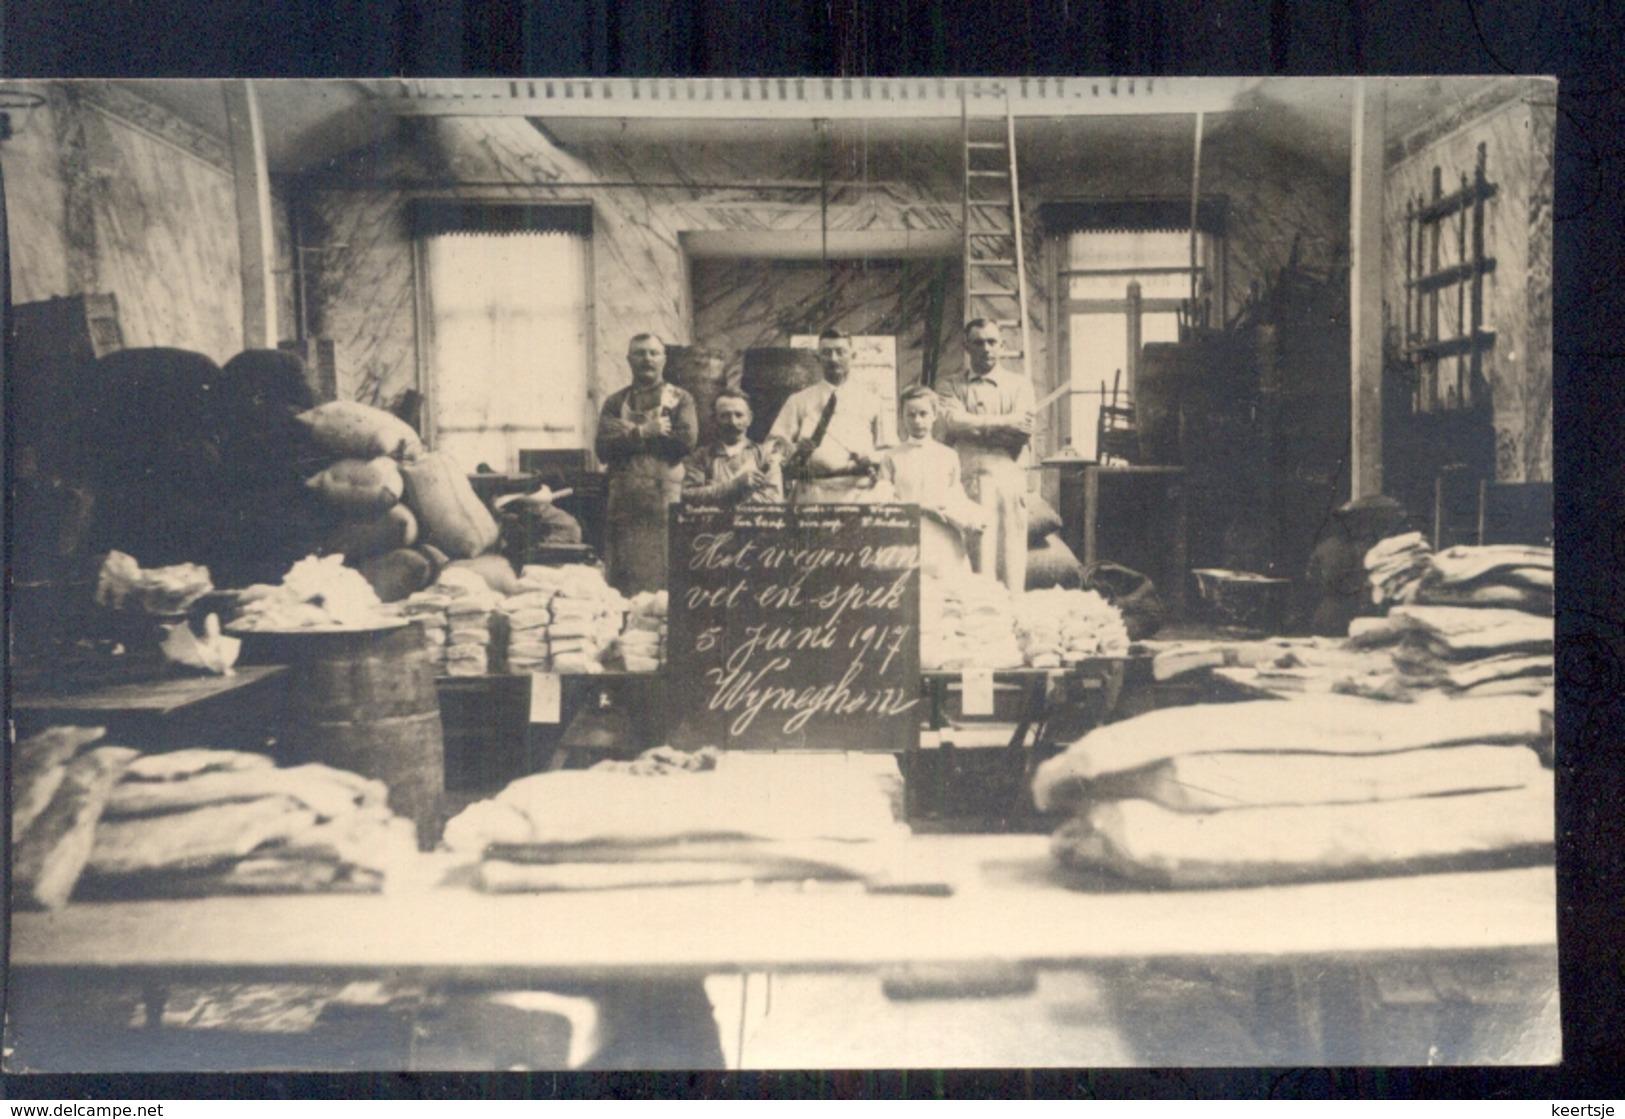 Belgie - Wyneghem Wijneghem - Slagerij -   -  1917 - Belgique